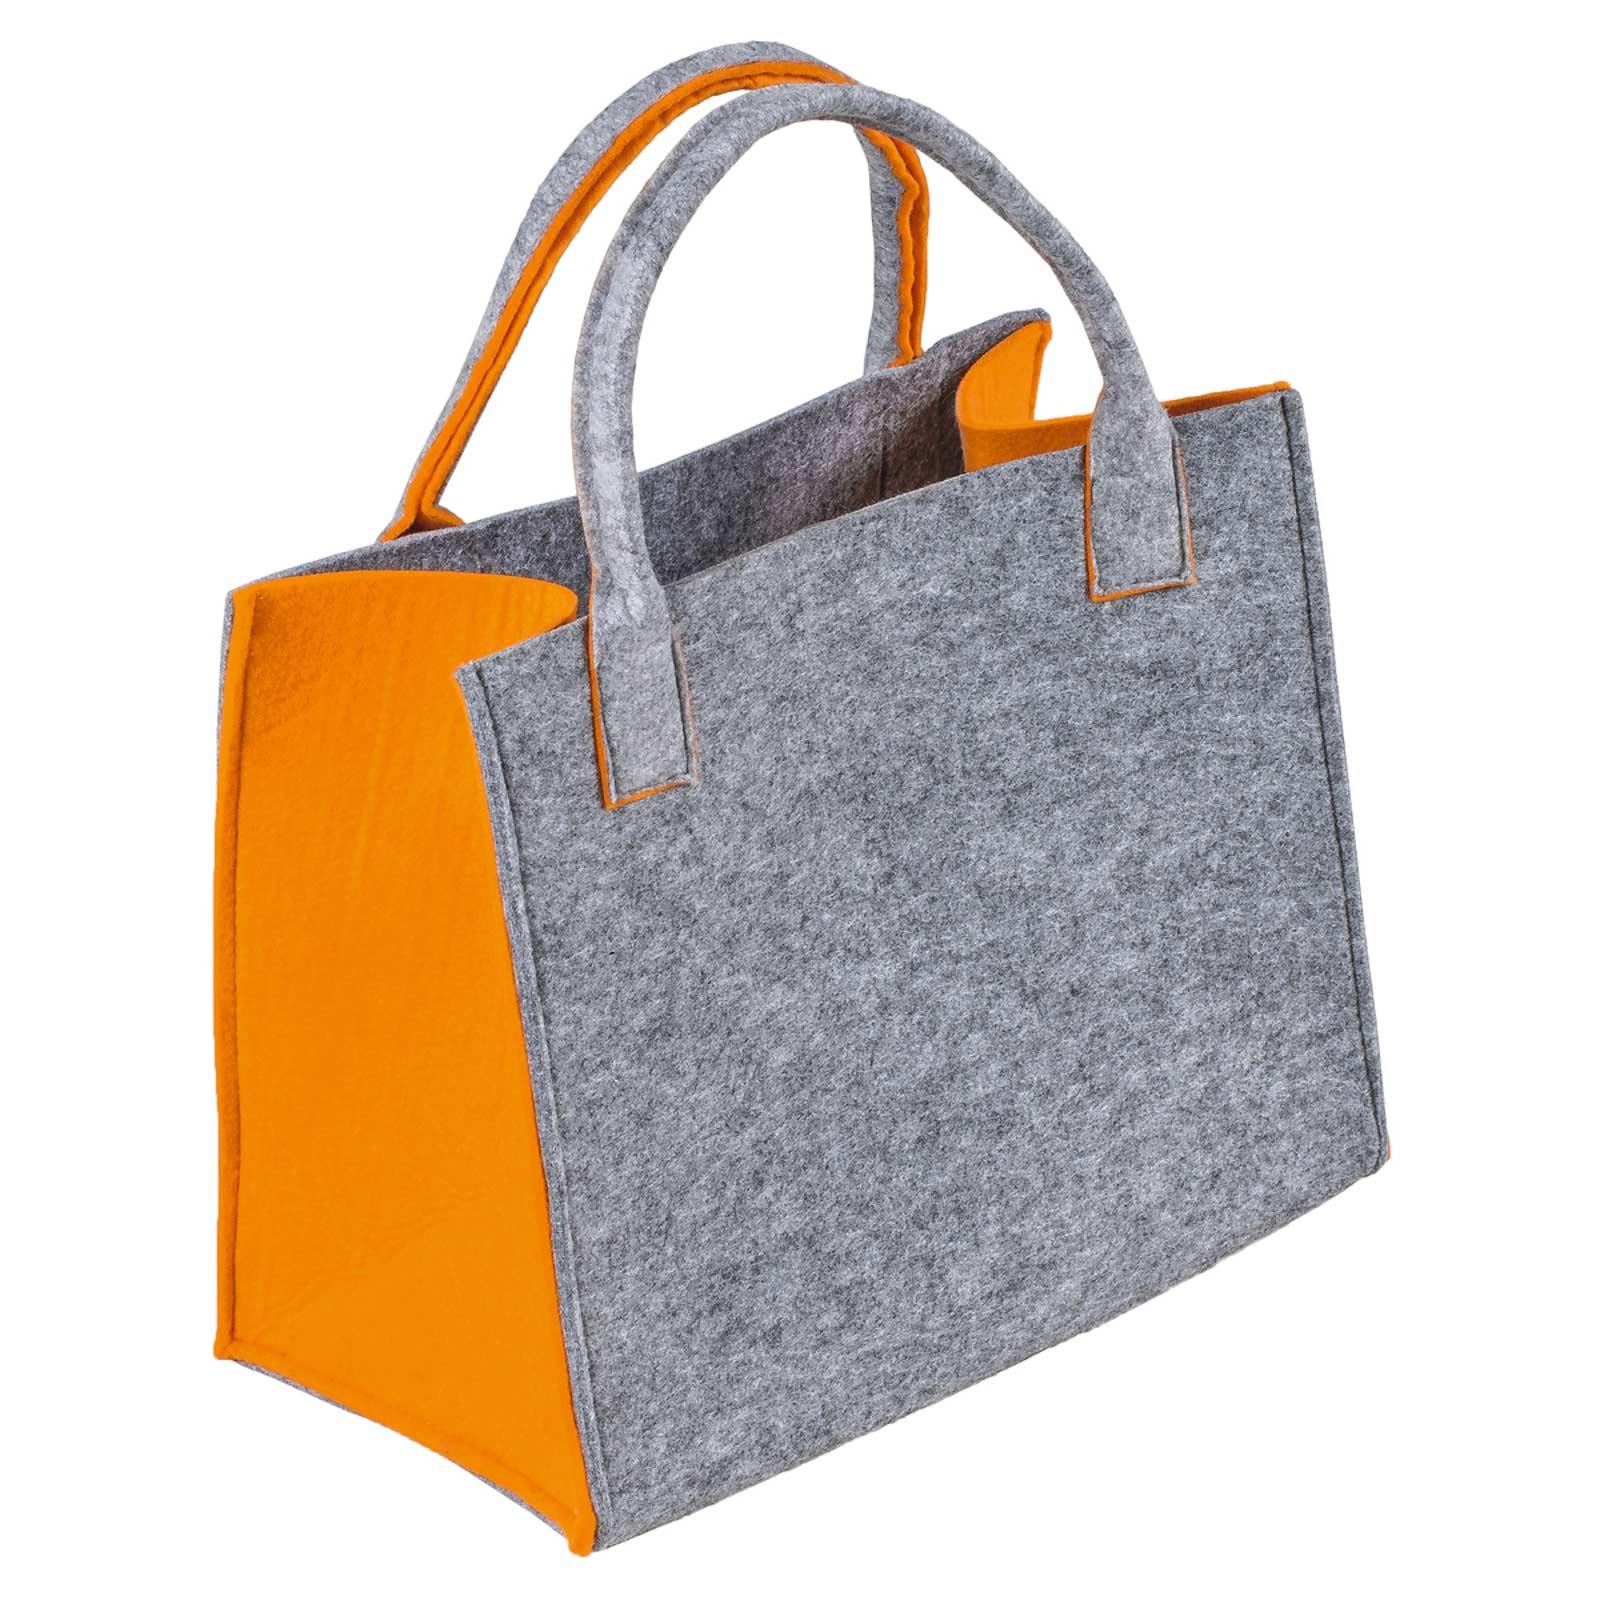 Filztasche, 35x20x43cm, zum gleich Benutzen oder Aufhübschen, 5mm Materialstärke – Bild 5